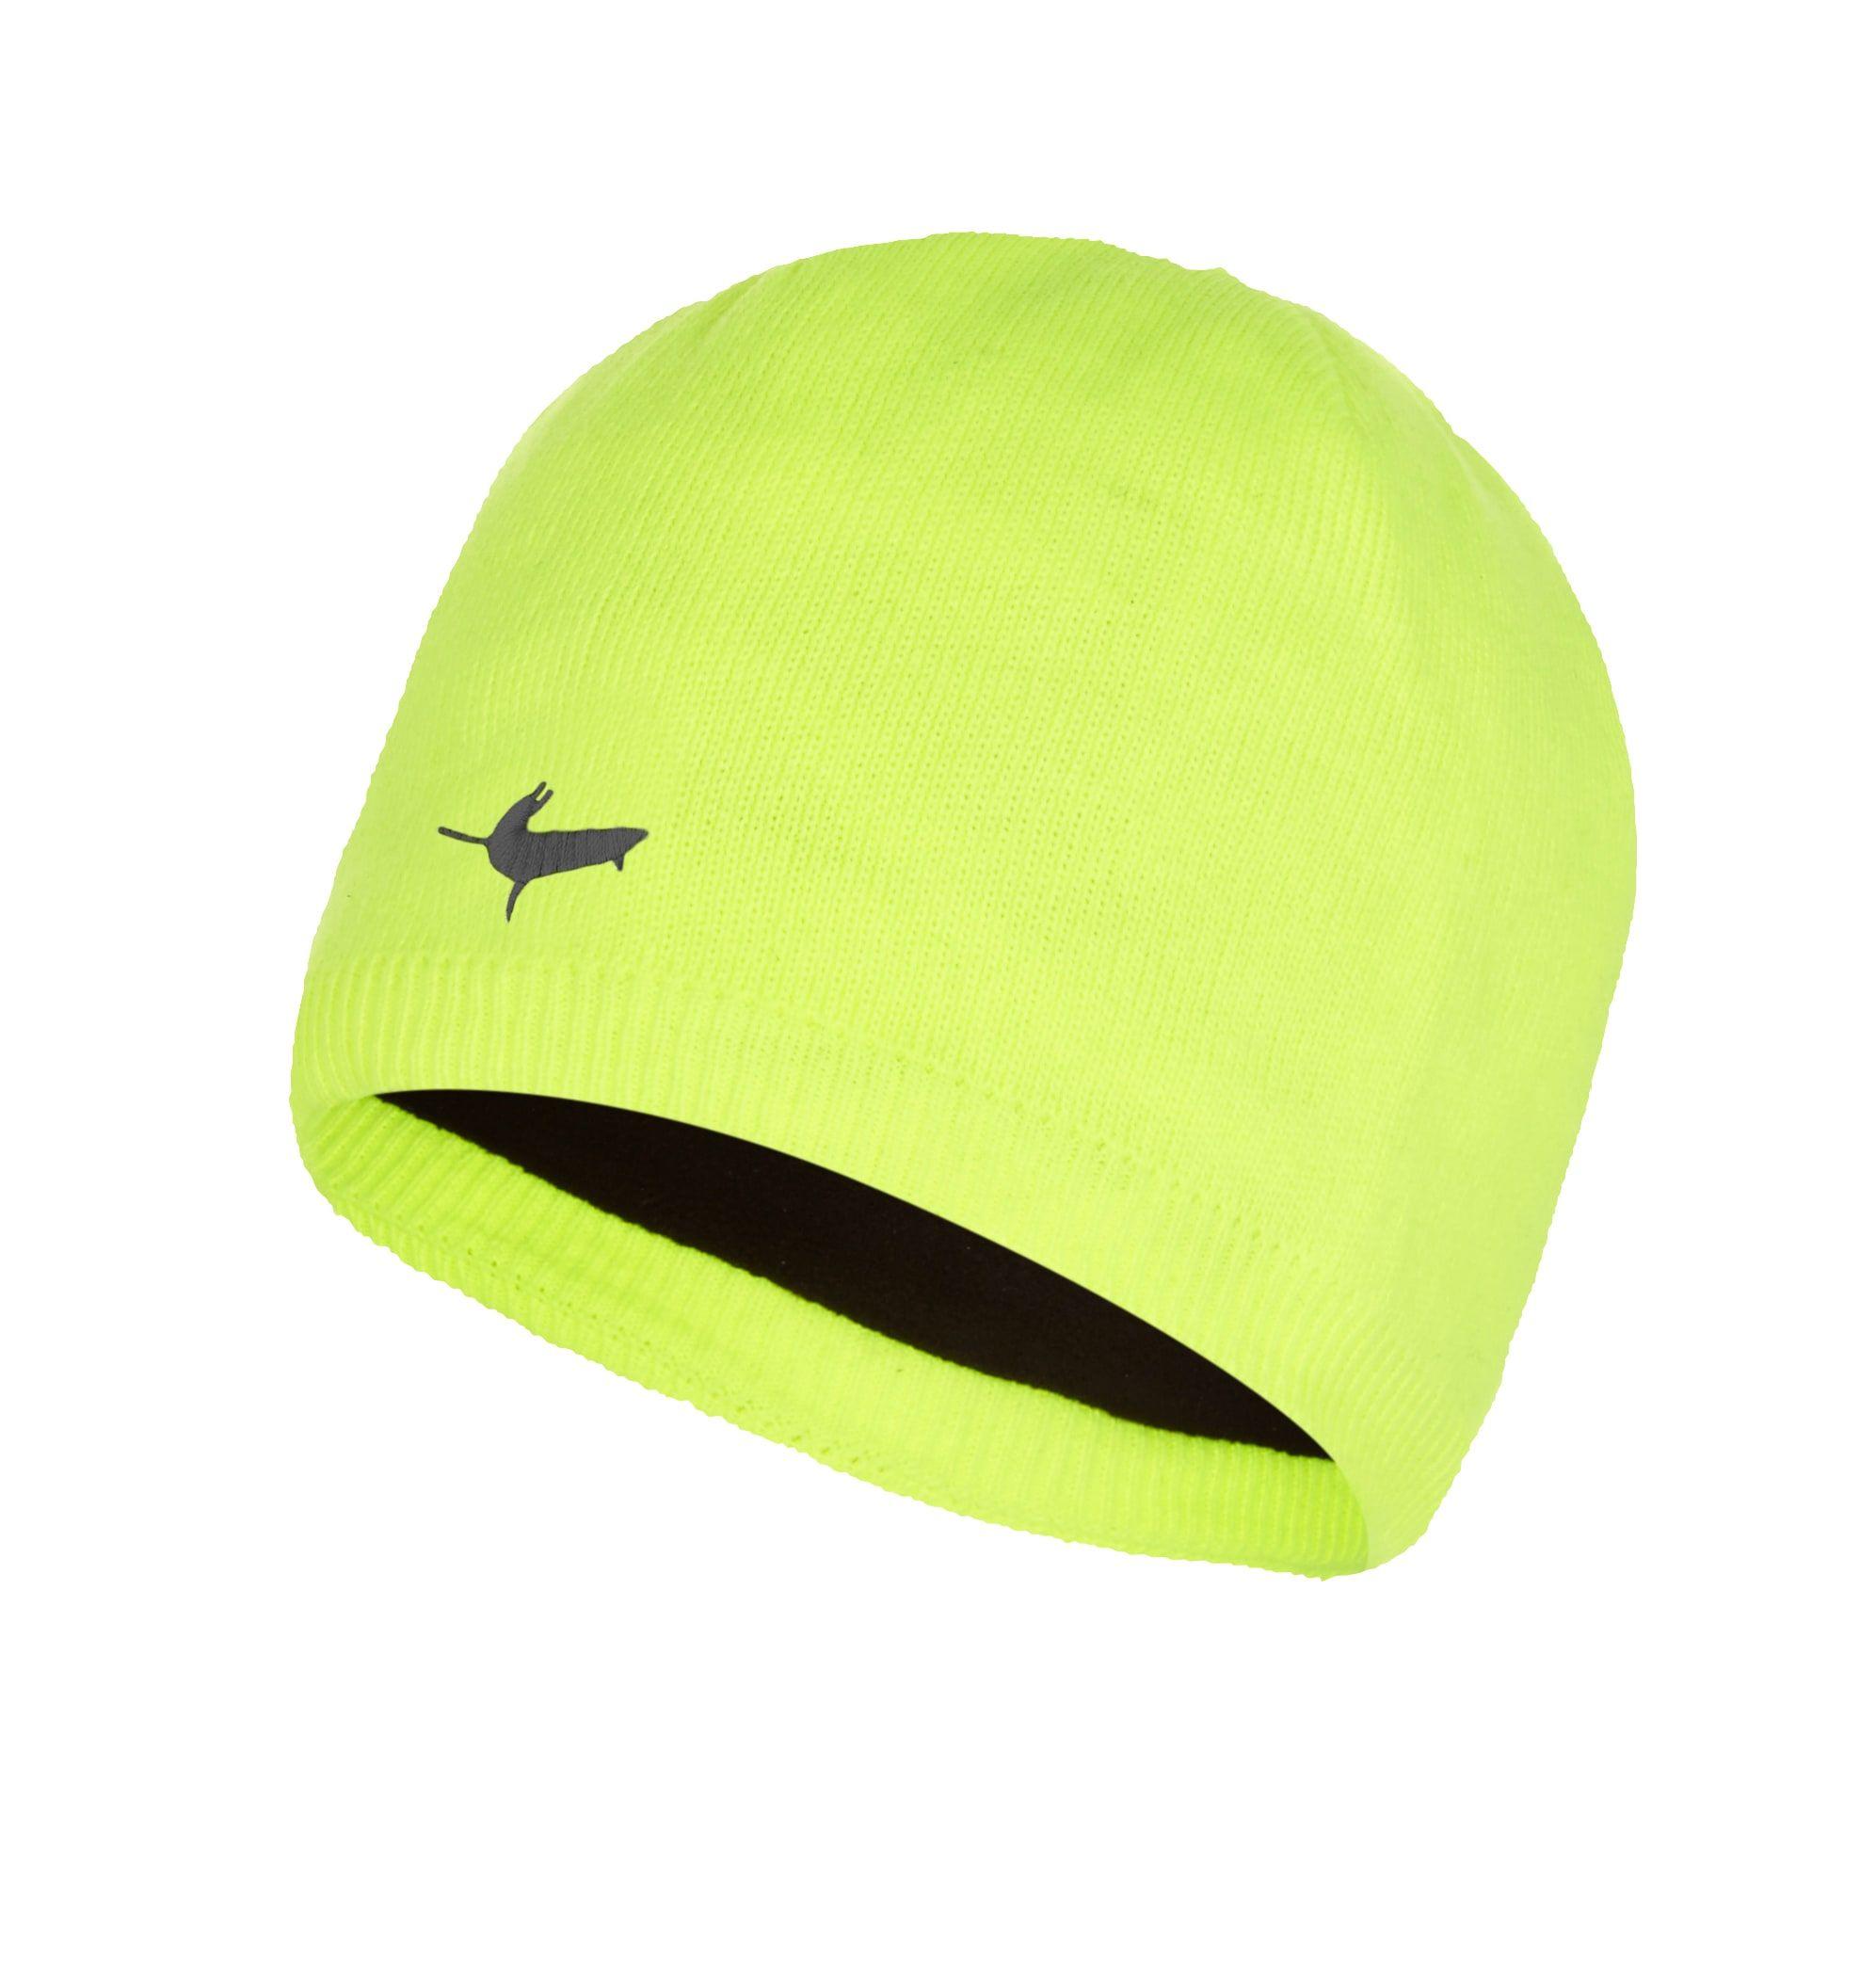 NEW Sealskinz Waterproof Unisex Outdoor Sports Running Hiking Skiing Beanie Hat